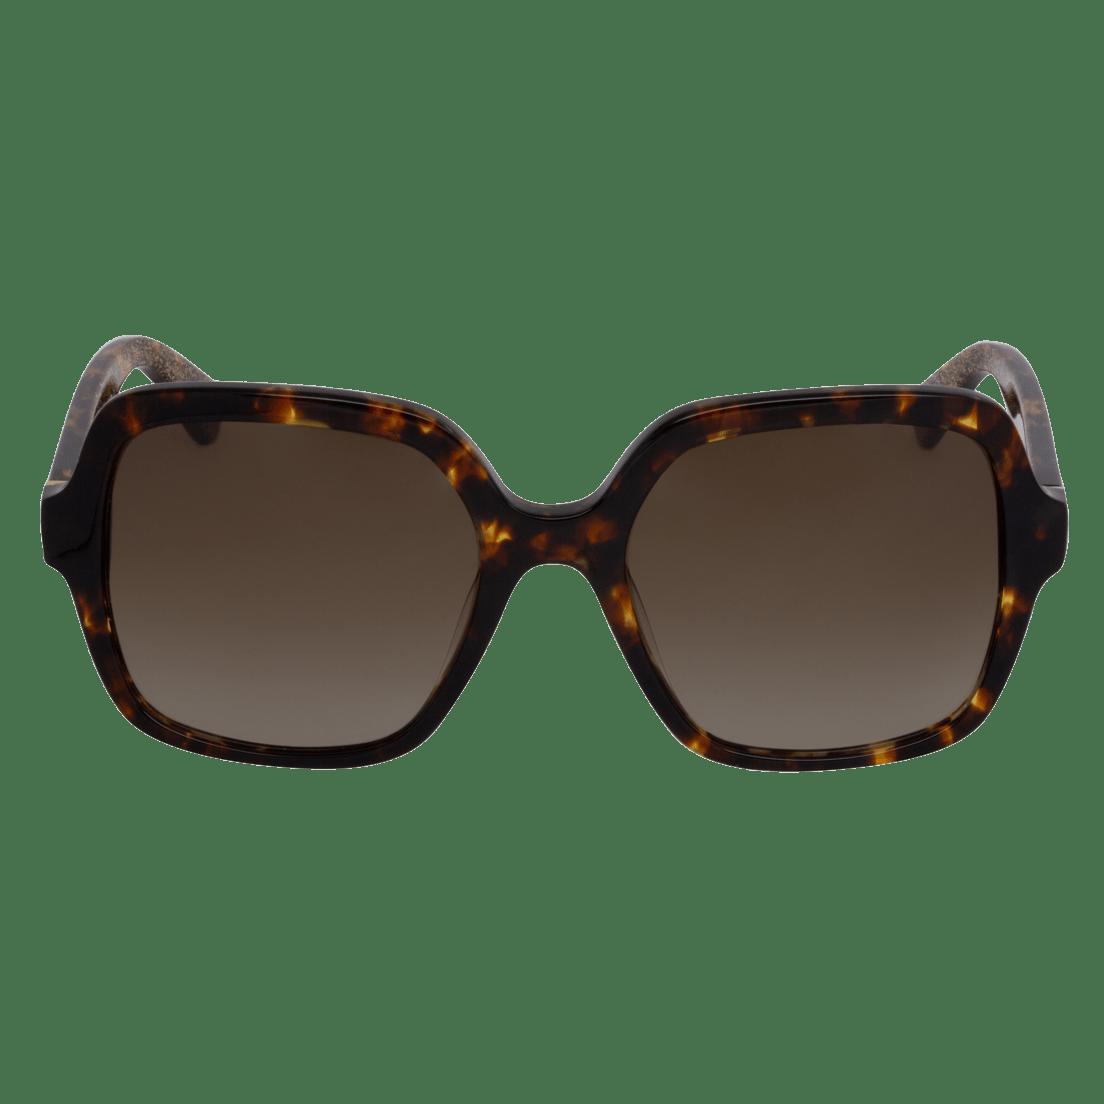 9fd9efe91a2 Kate Spade Katelee Sunglasses